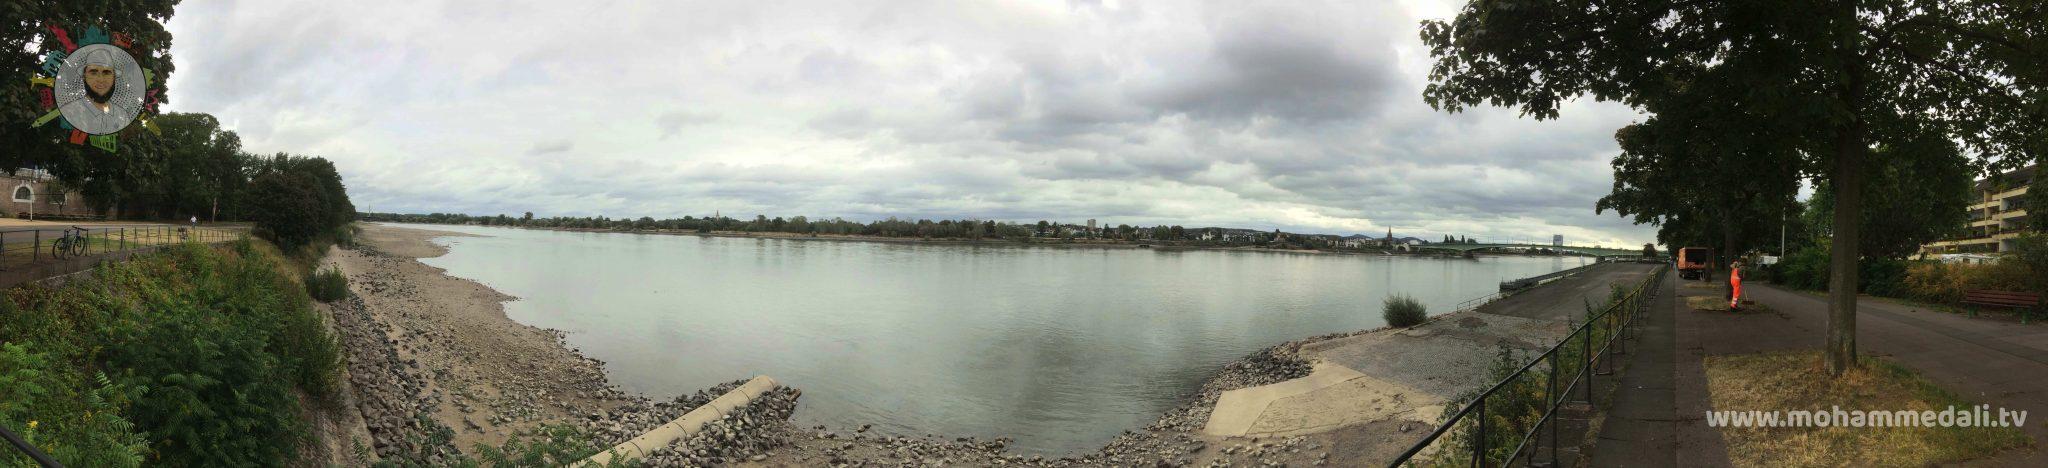 Breathtaking panoramic view on river rhine flowing through Bonn